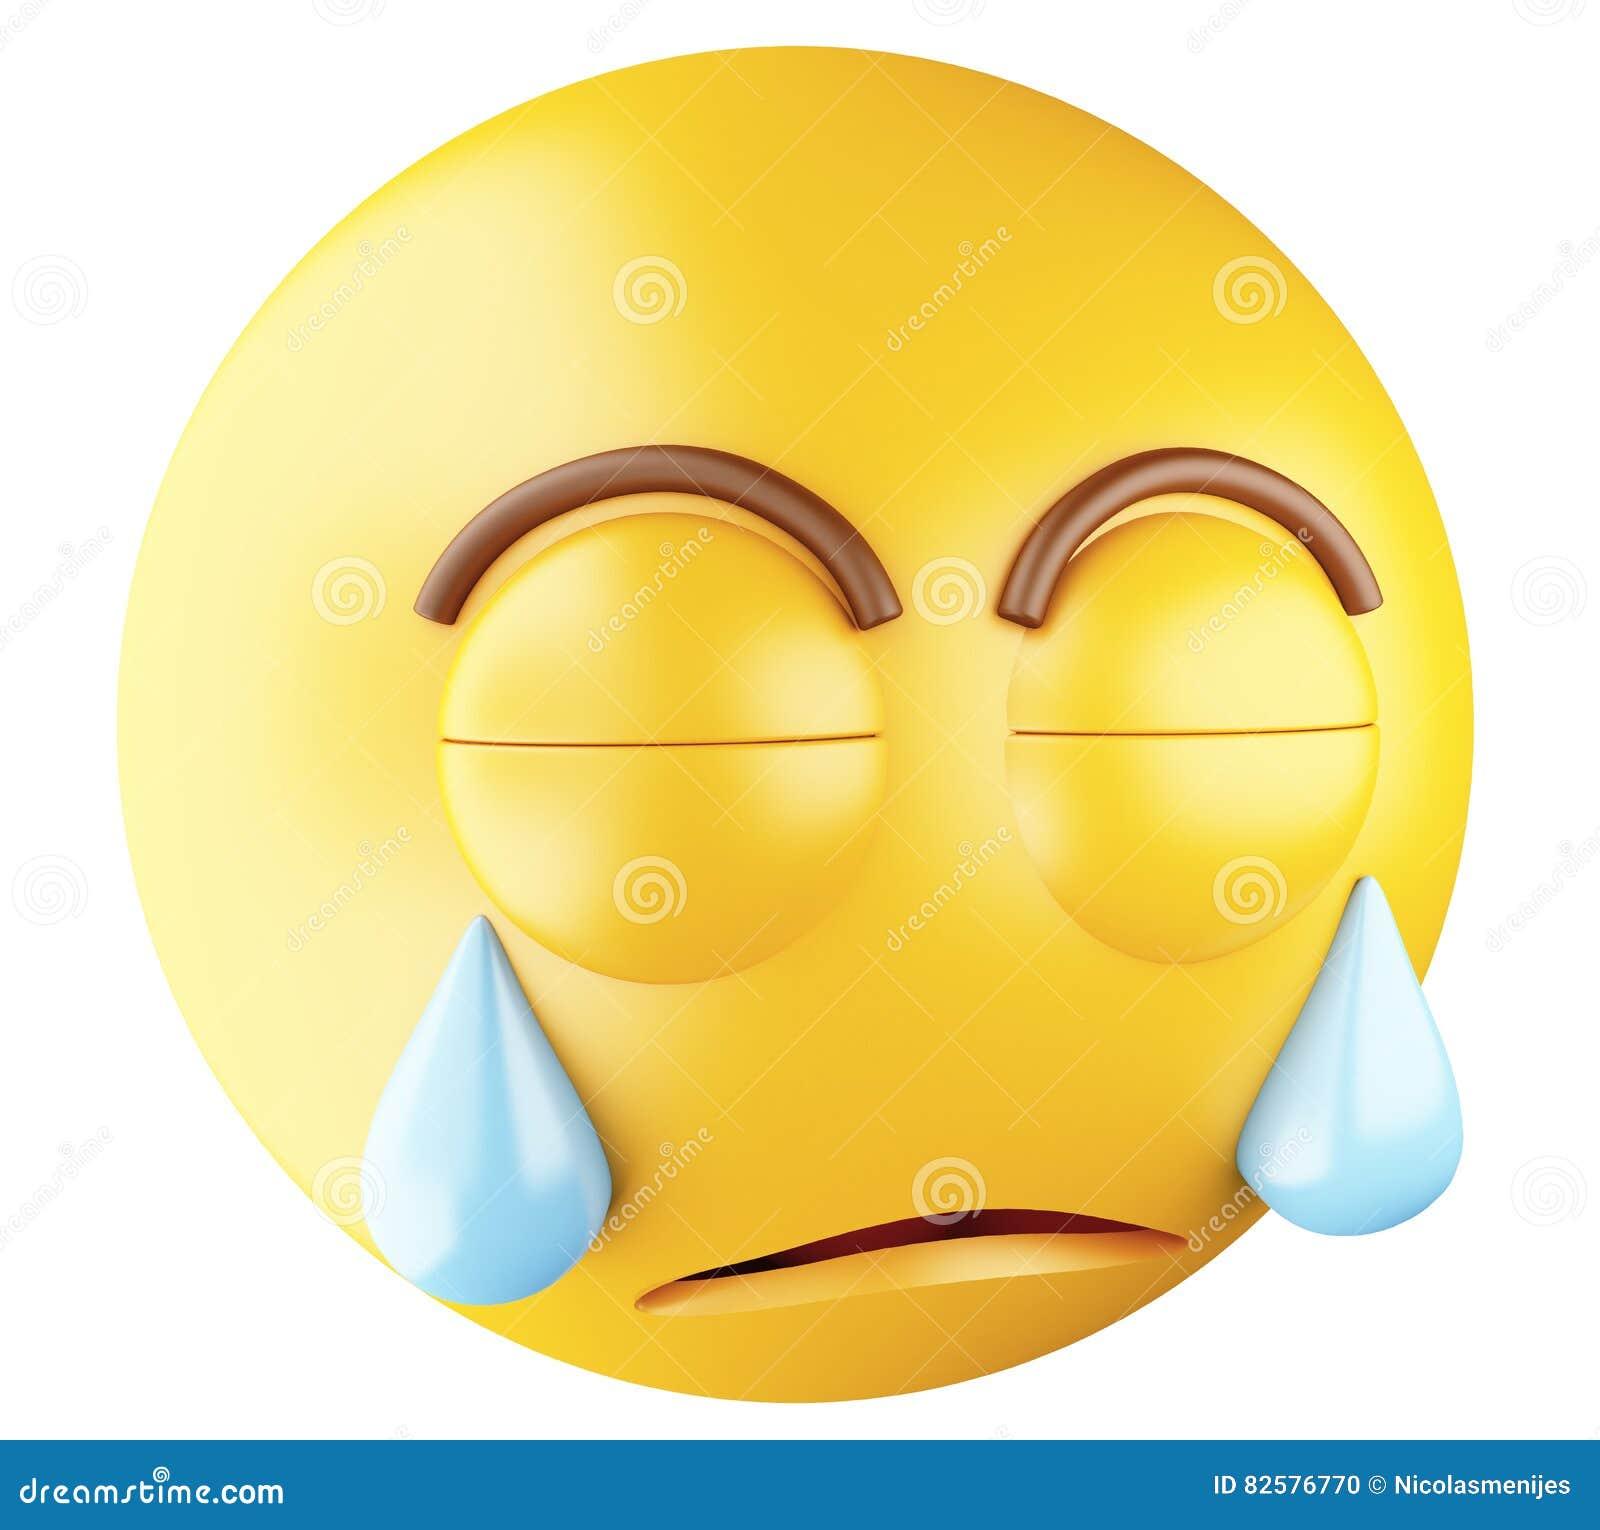 Download 3D Sad Emoji Crying Stock Illustration Of Facial